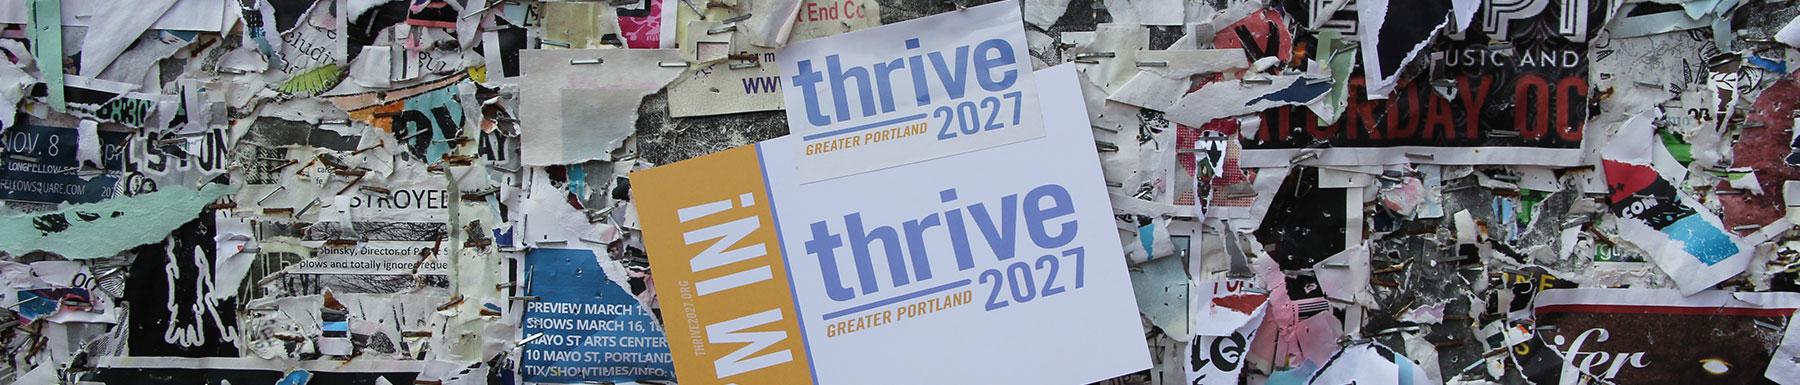 Thrive 2027